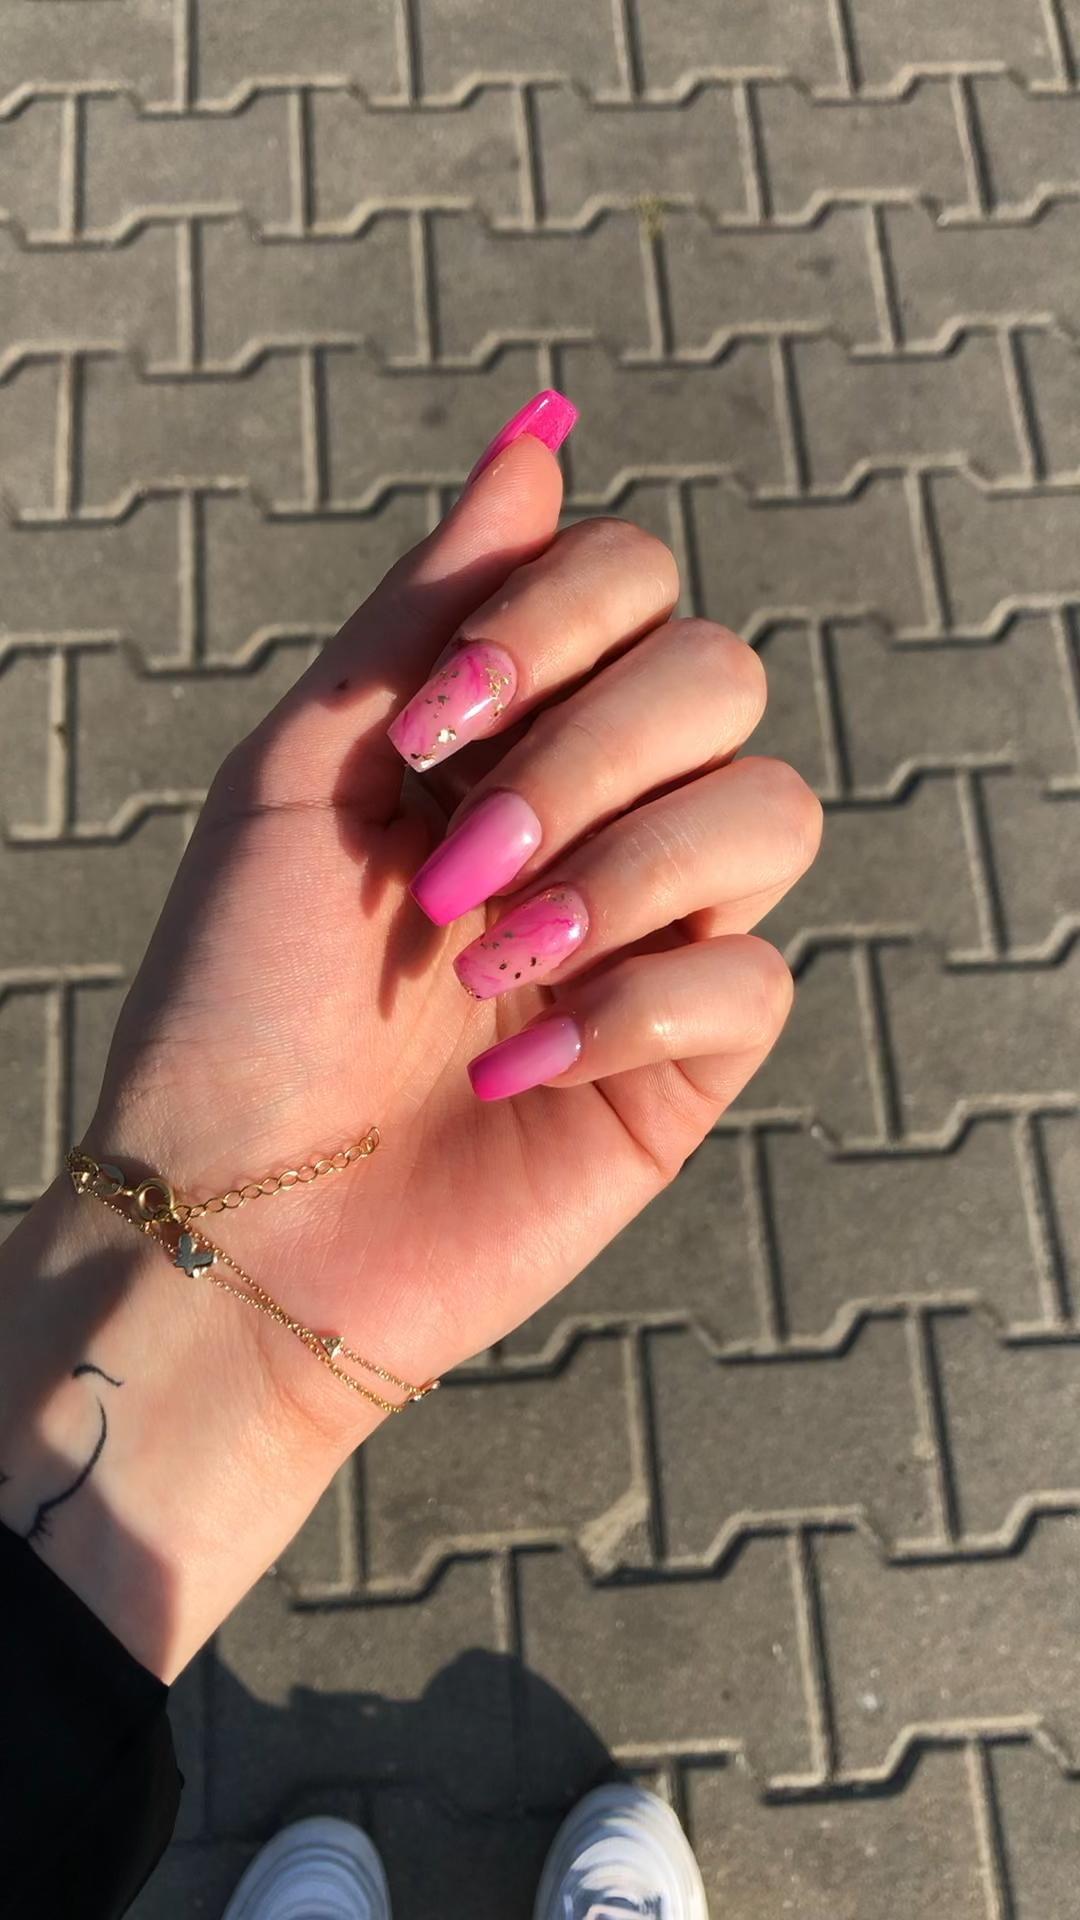 #nails #nailsdesign